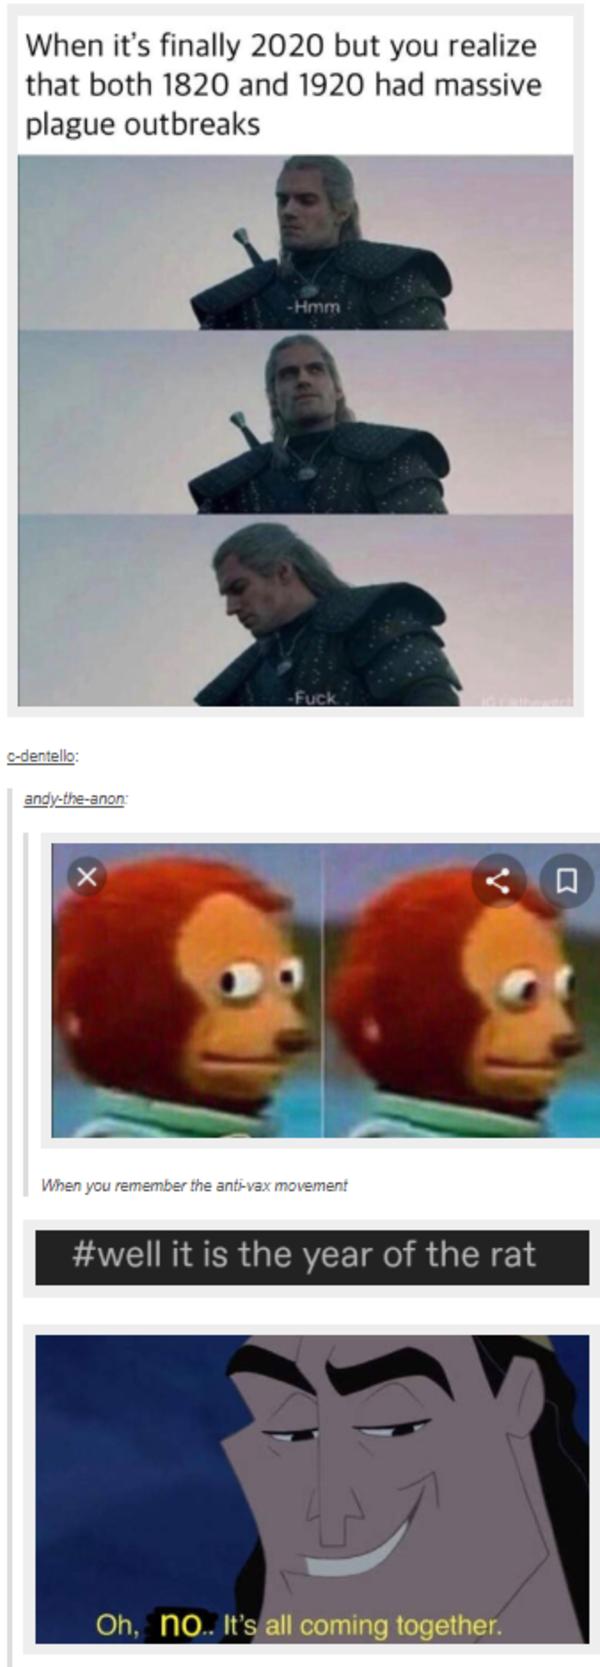 Meme S Quotes Memes Its Memes Laughing Memes Memes Quotes Funnie Memes I Meme Truthful Memes Happ Really Funny Memes Funny Relatable Memes Memes Quotes